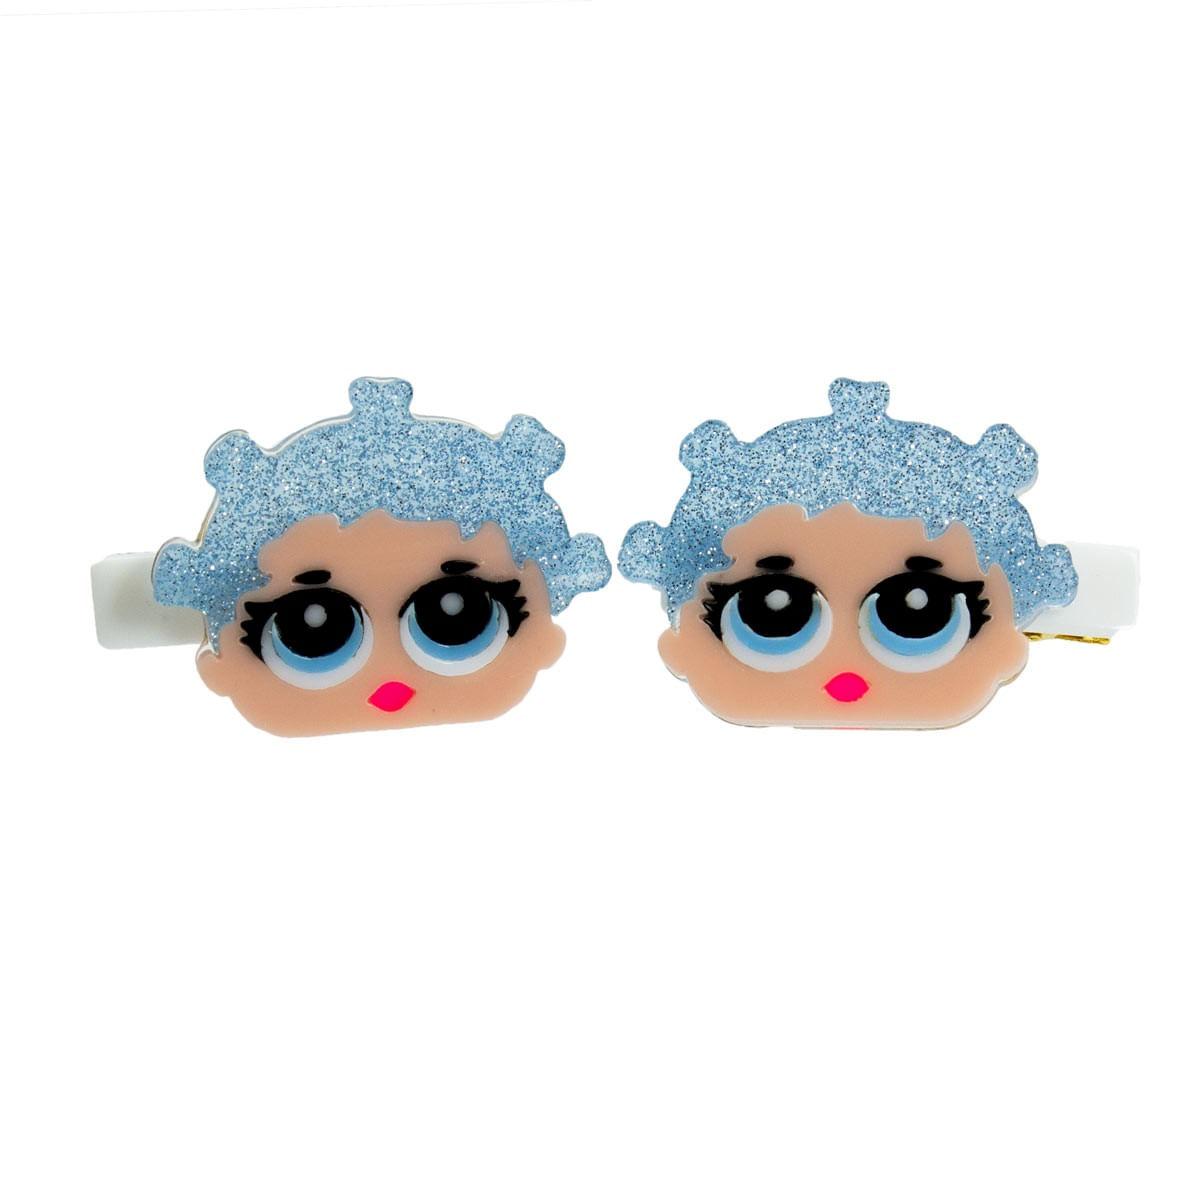 Presilha-Infantil-Lol-Surprise-Boneca-Cabelo-Glitter-Azul-Ludique-et-Badin